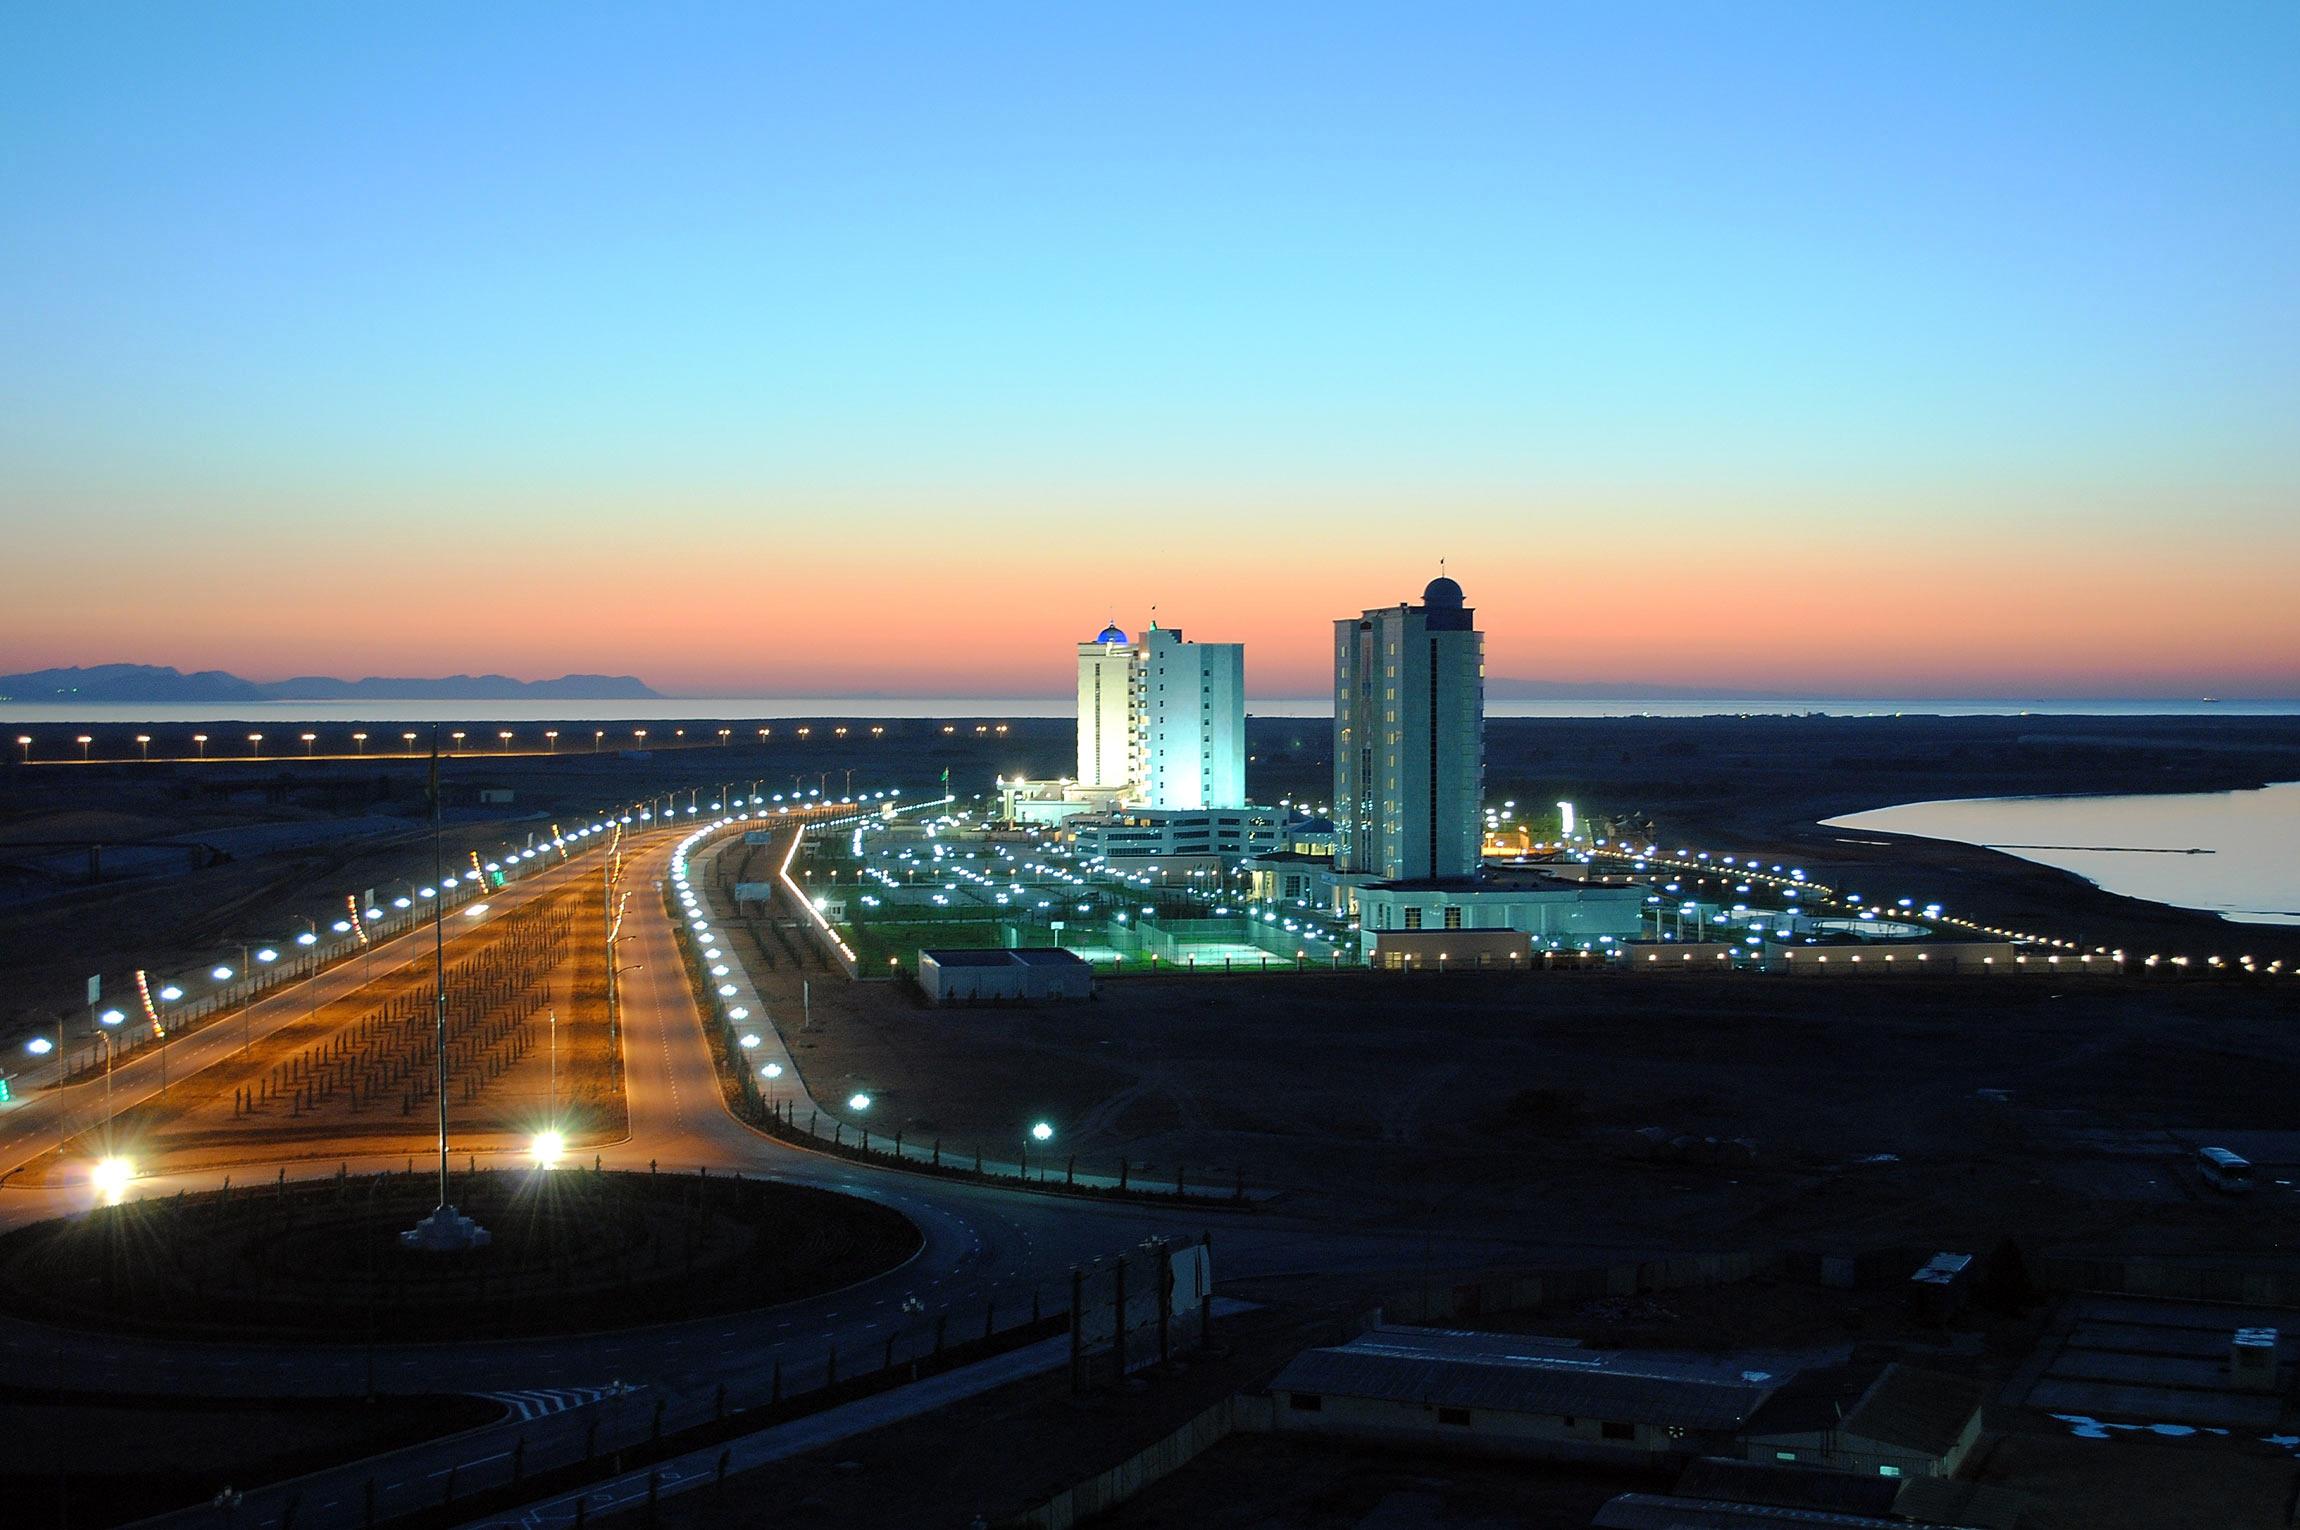 аваза туркмения фото природе, жизни